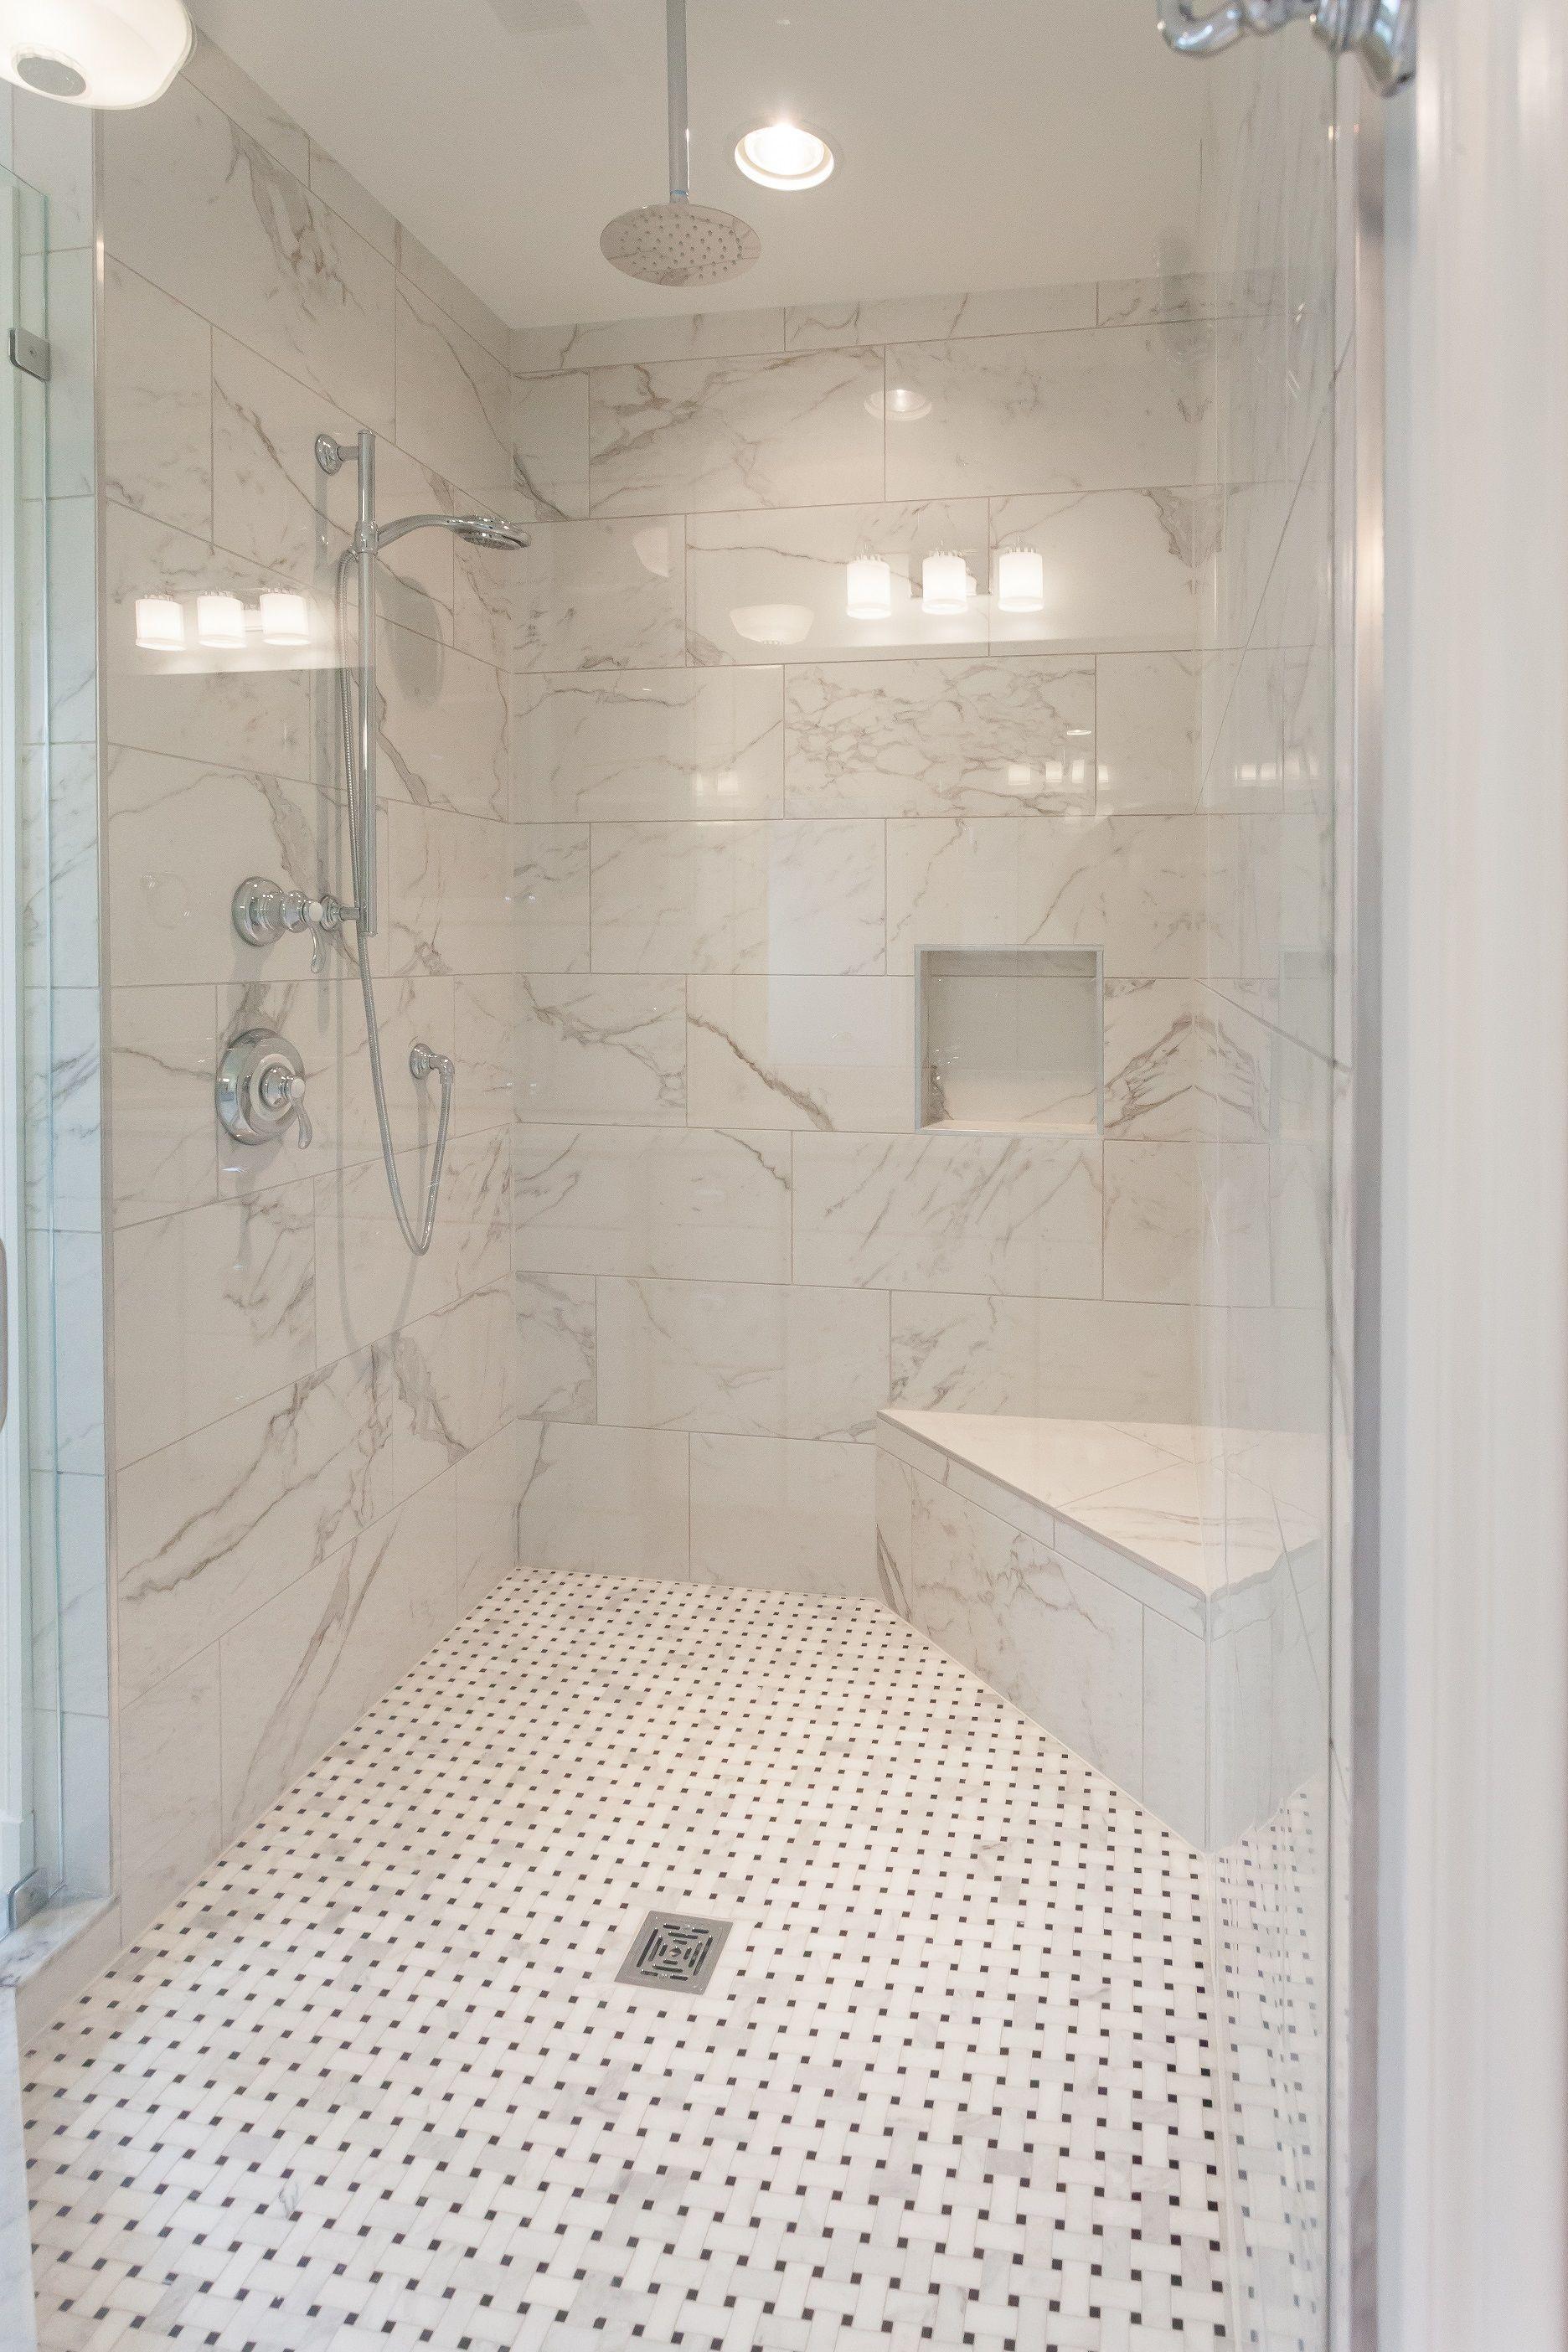 Walk In Shower With Built In Corner Shower Seat And Basketweave Floor Tile In Master Bathroom Of Cust Bathroom Remodel Designs Shower Floor Tile Small Bathroom